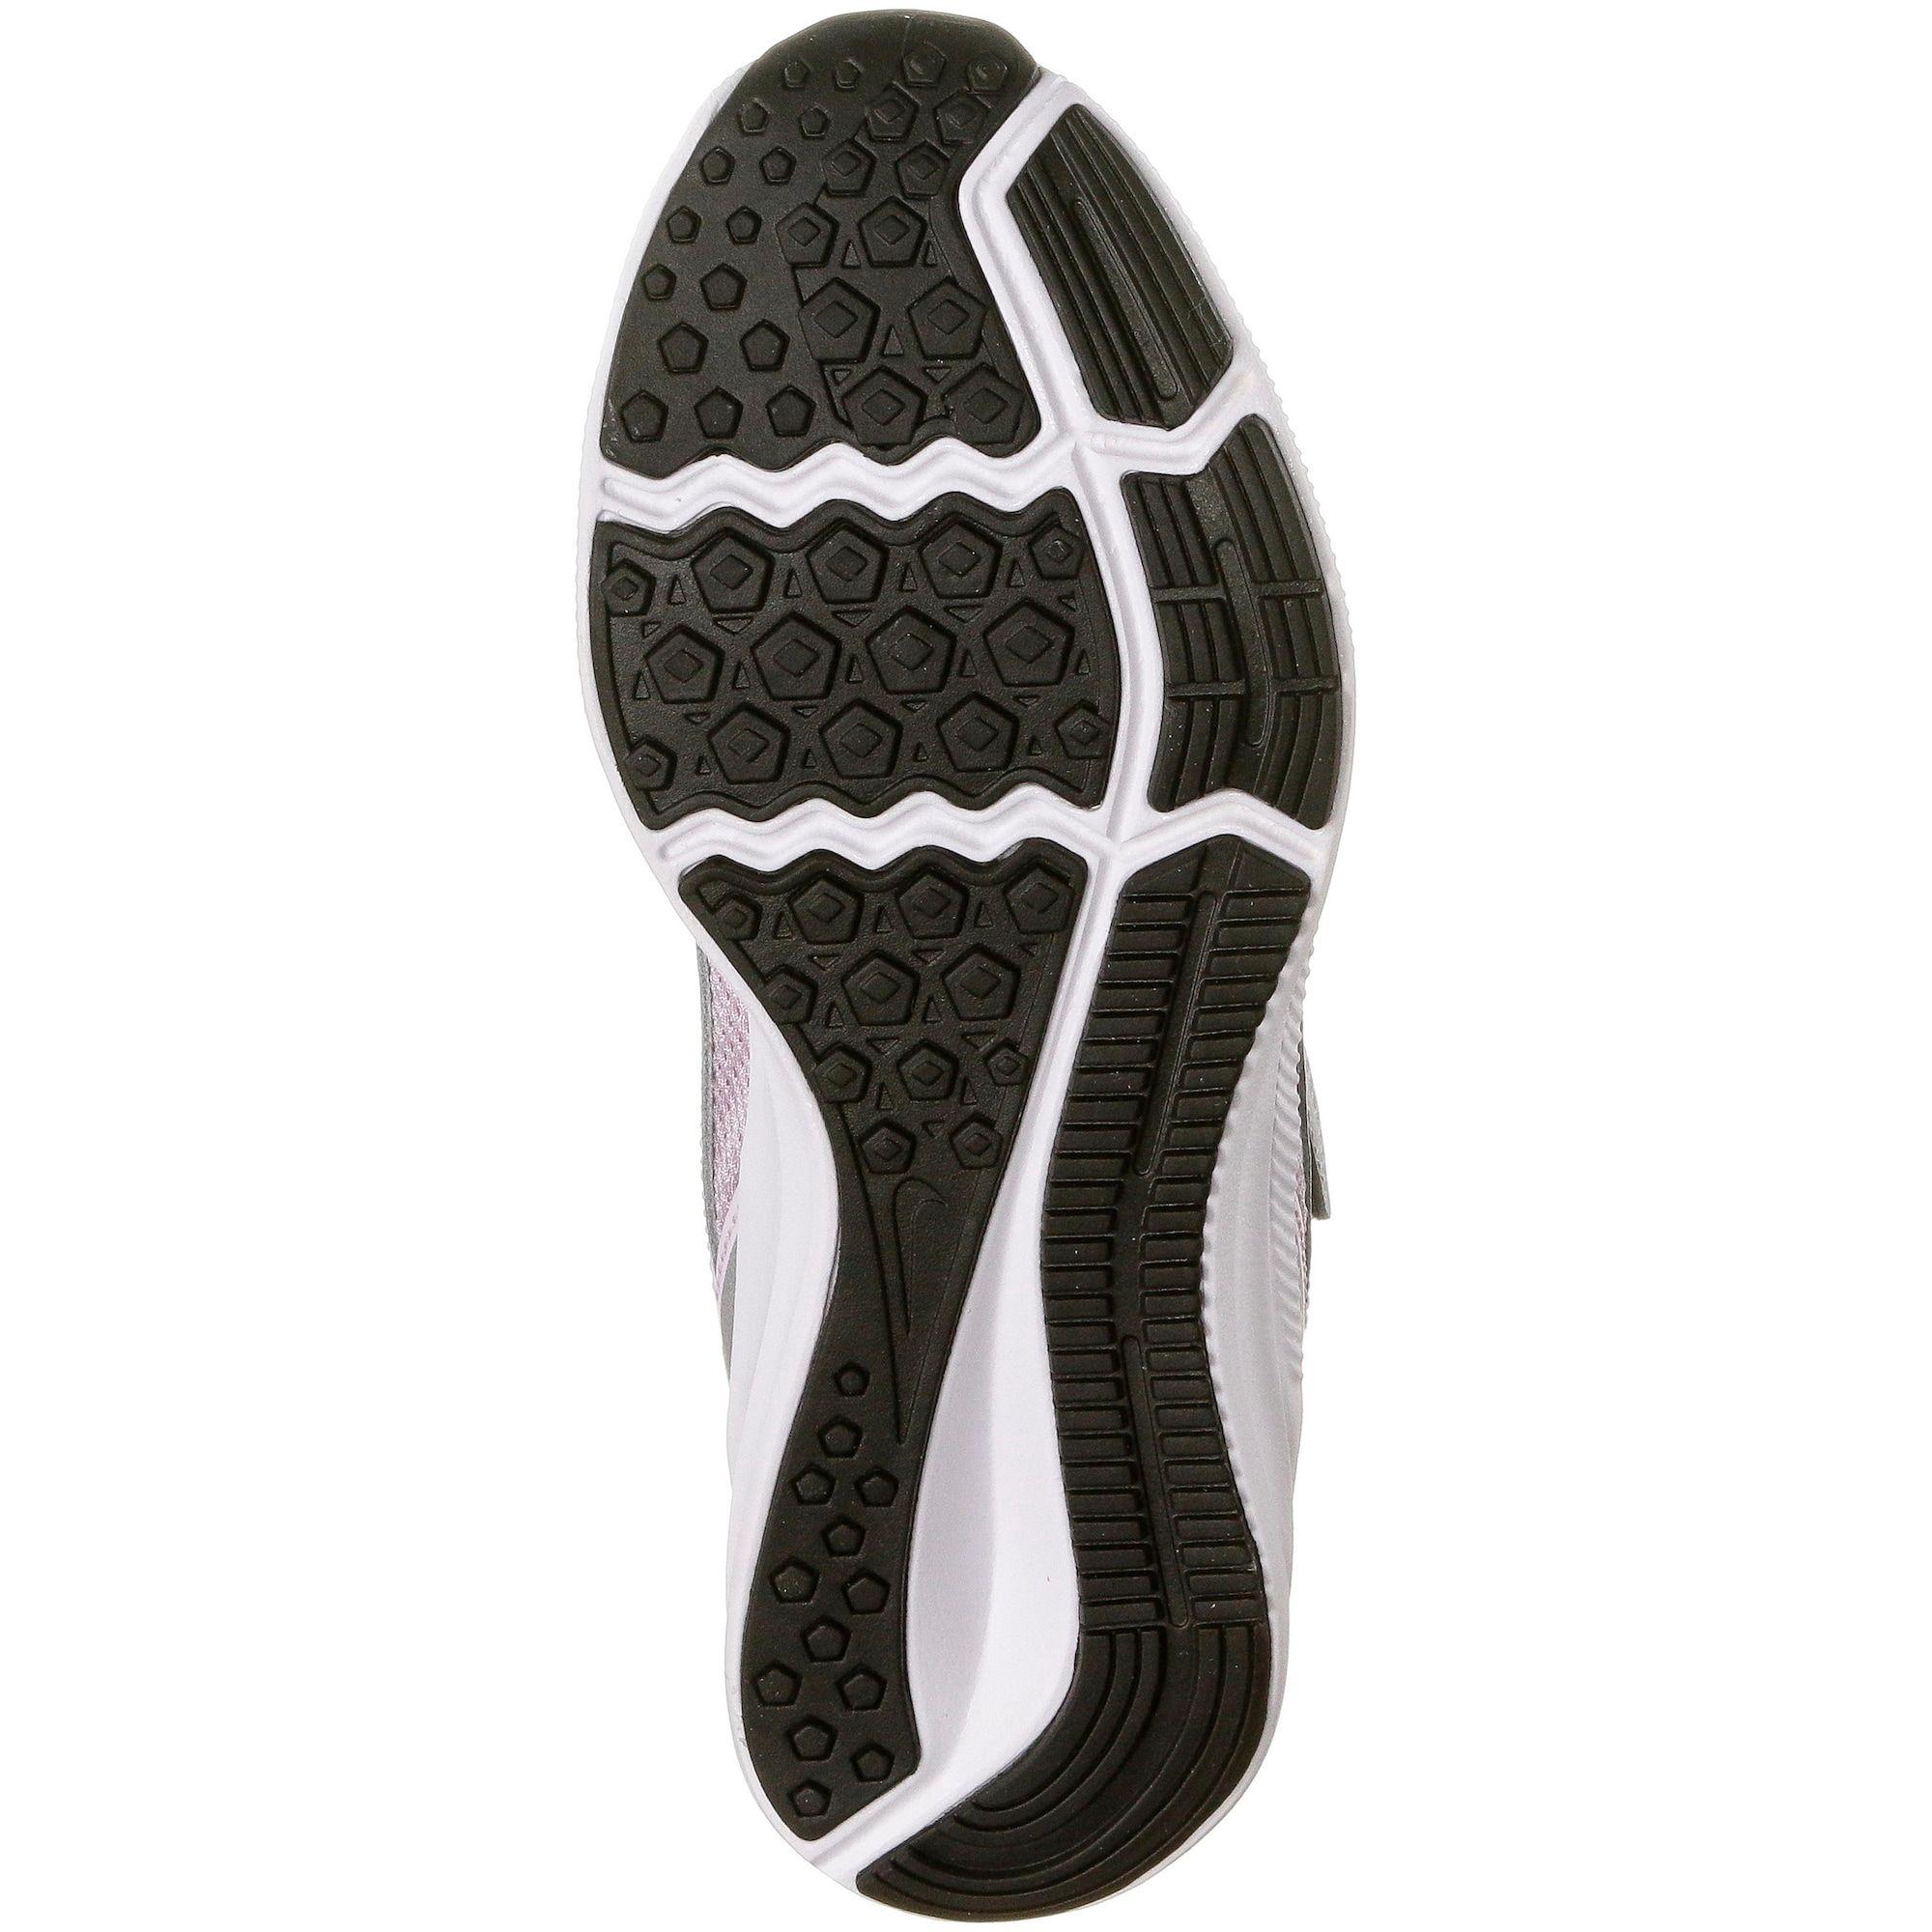 Nike Sport Schuhe Nike Downshifter 9 Psv Jungen Altrosa Grosse 34 Nike Schuhe Und Altrosa